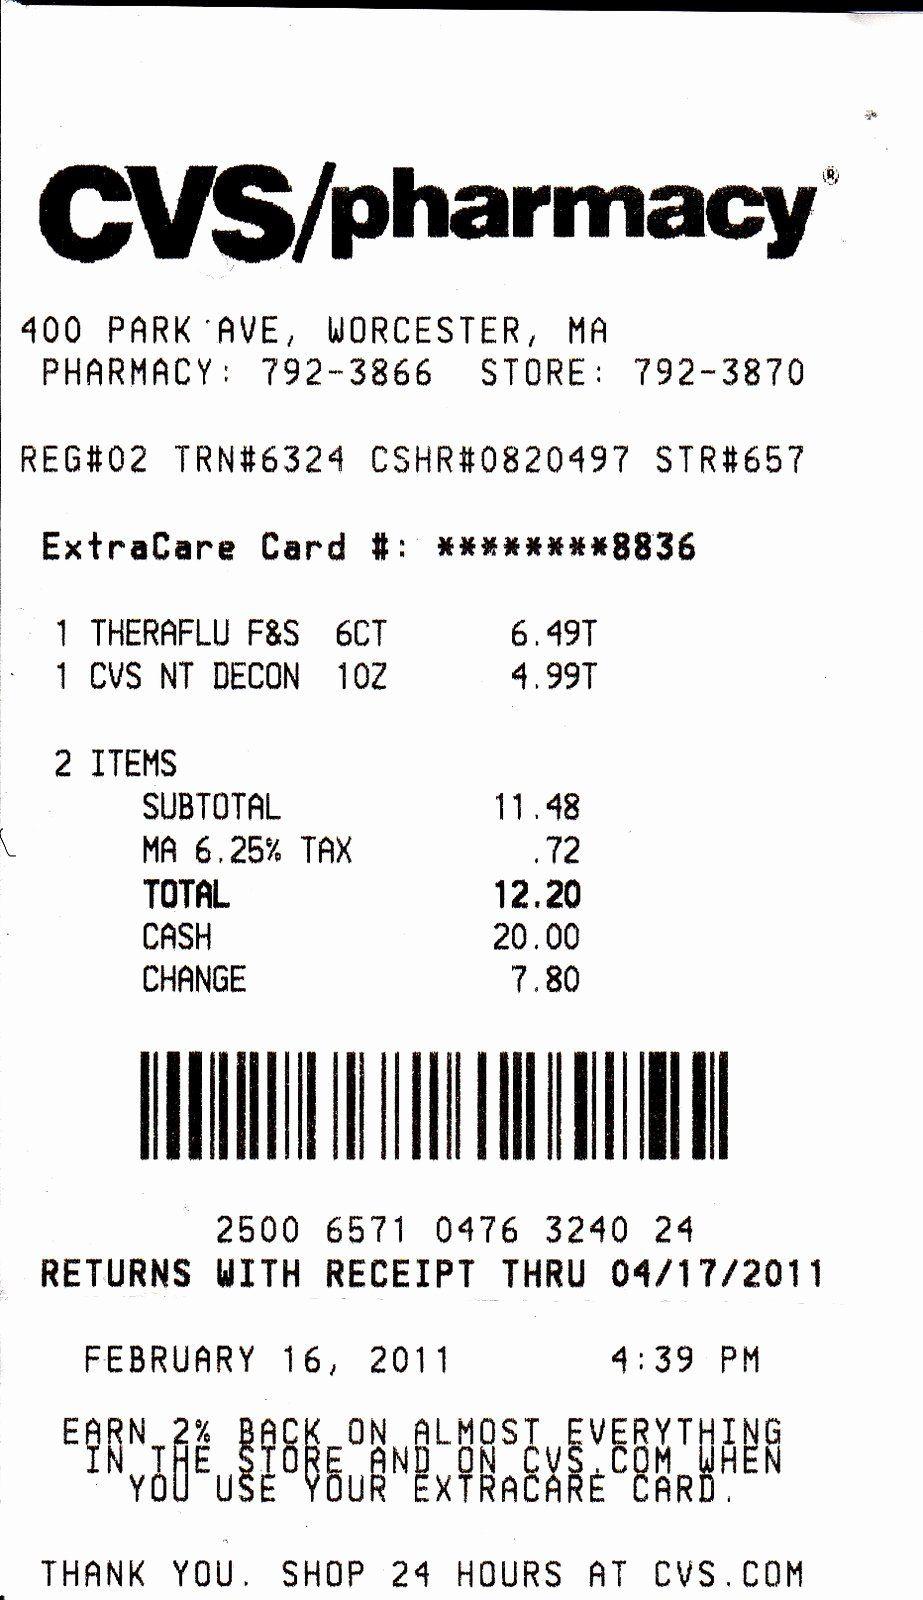 Fake Prescription Label Generator Unique Pill Bottle Label By Lastgambit On Deviantart Business Templ Label Templates Business Template Bottle Label Template